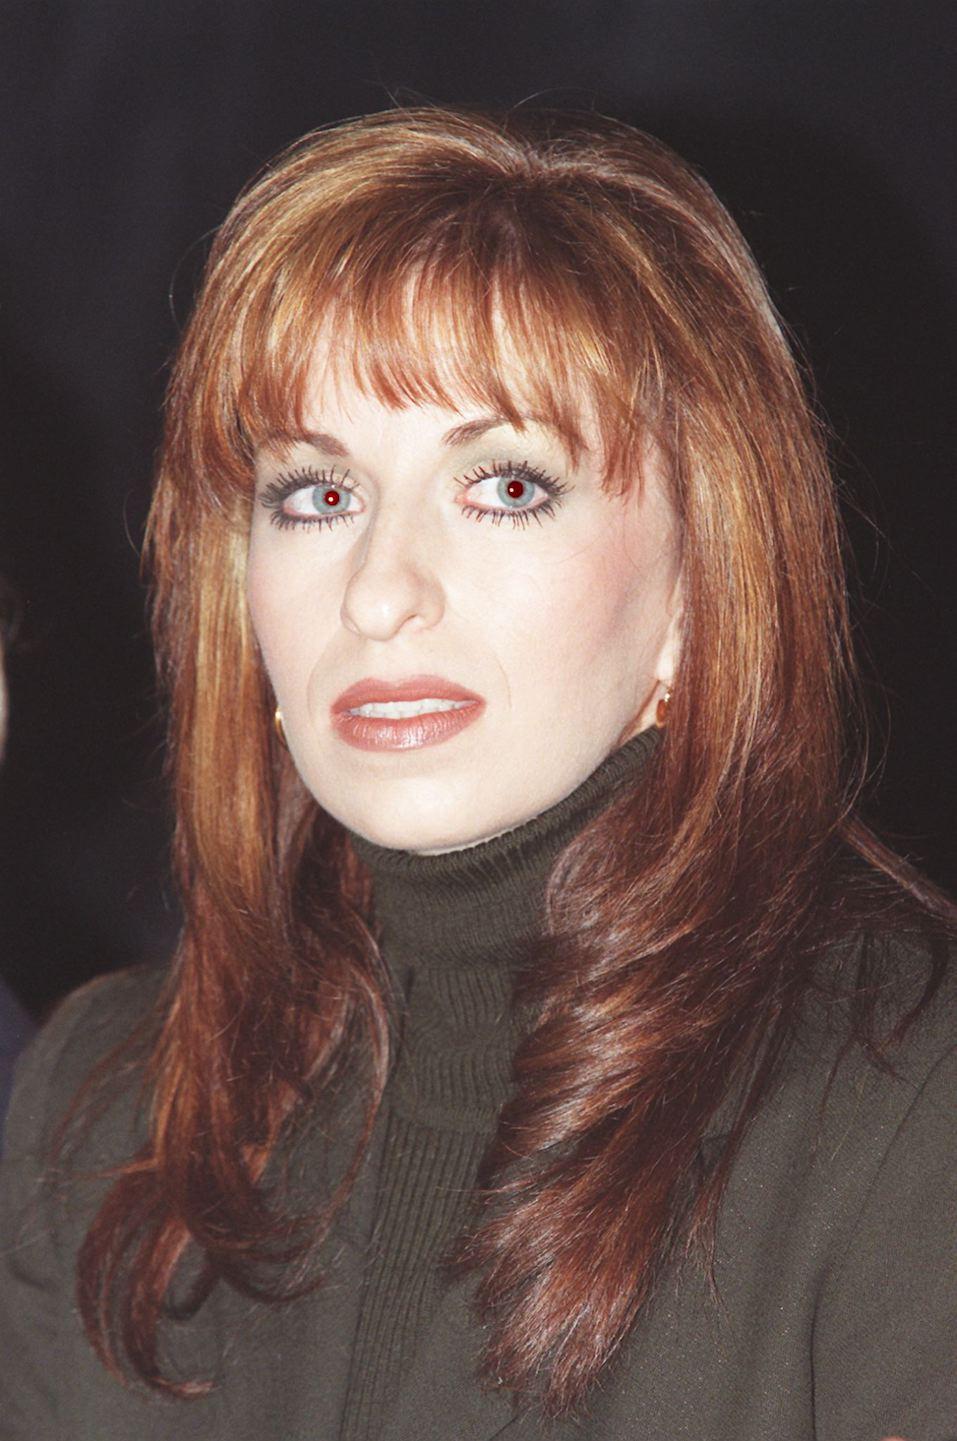 Paula Jones, who has accused US President Bill Clinton of sexual harrassment